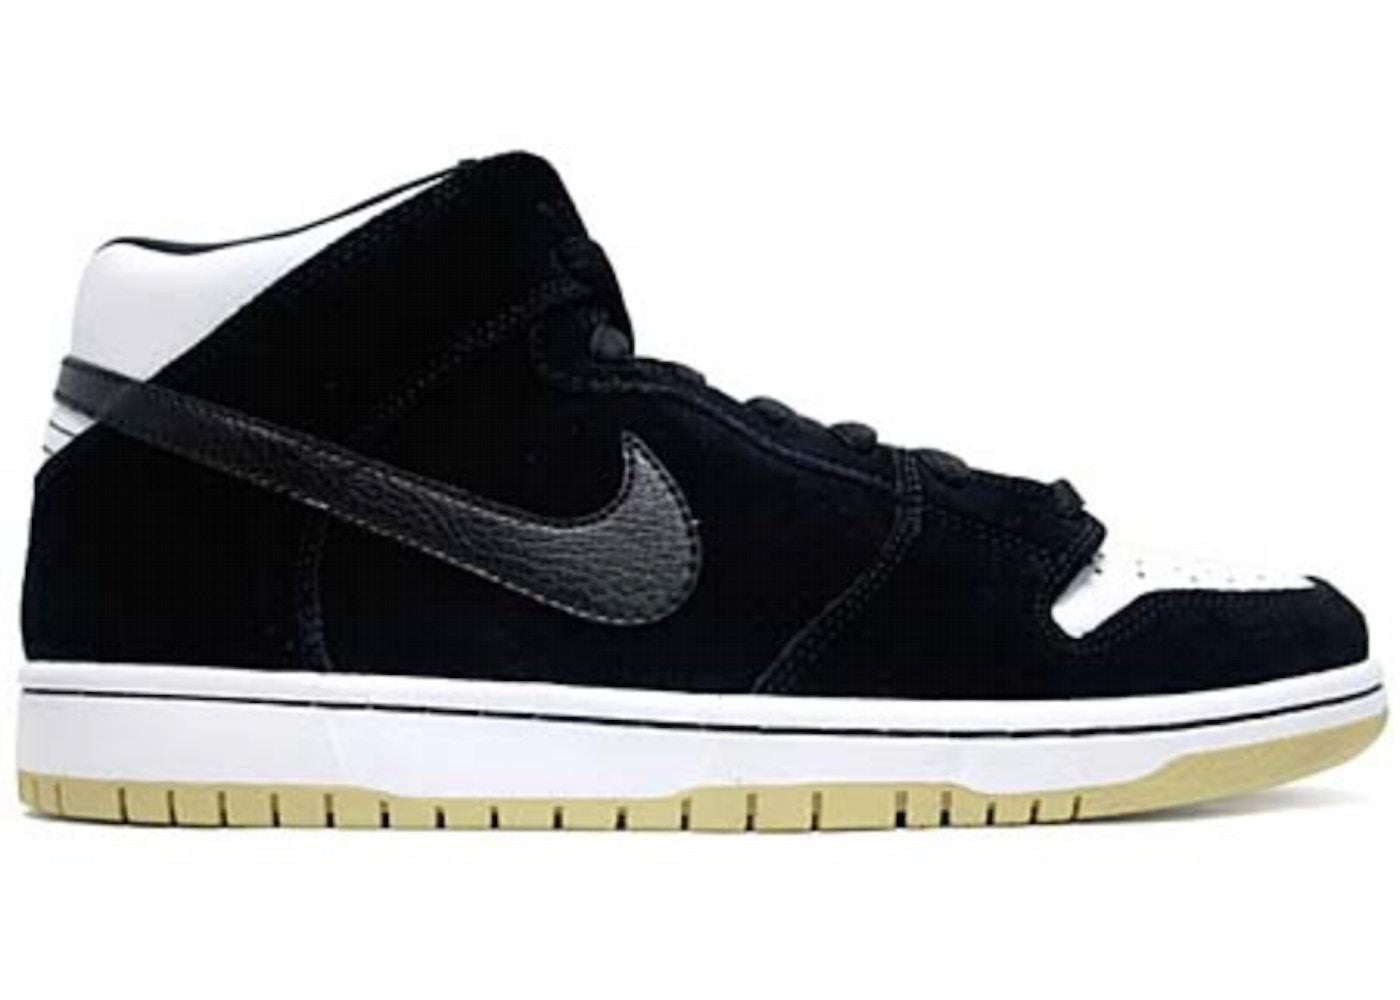 reputable site cd463 8acdd Nike SB SB Dunk Mid Shoes - Last Sale